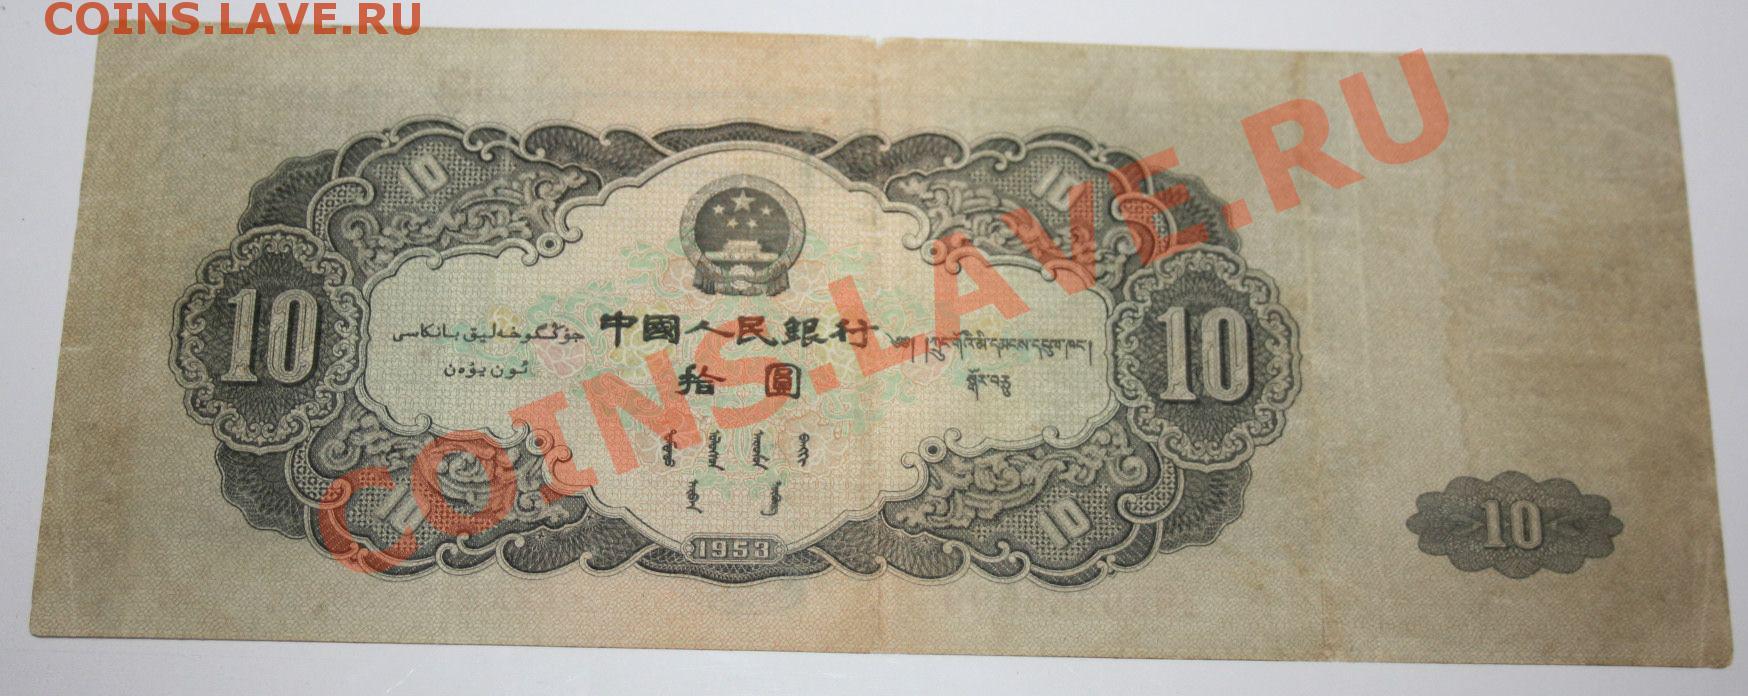 Юань 1953 1 рубль ссср 1989 мусоргский цена